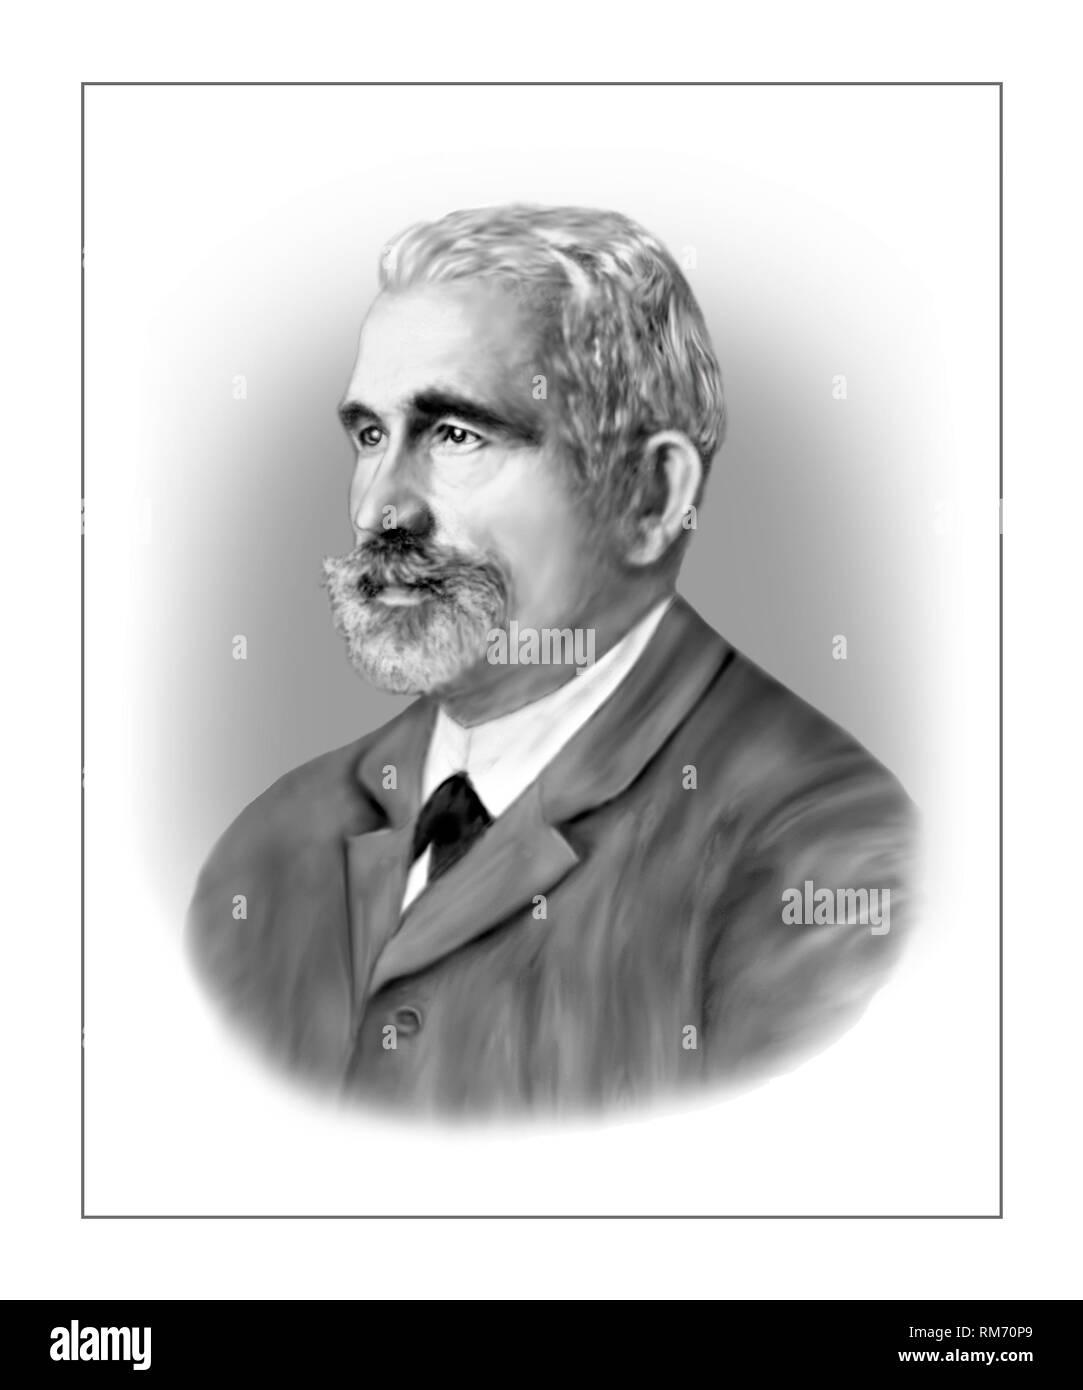 Emil Kraepelin 1856-1926 German Psychiatrist - Stock Image